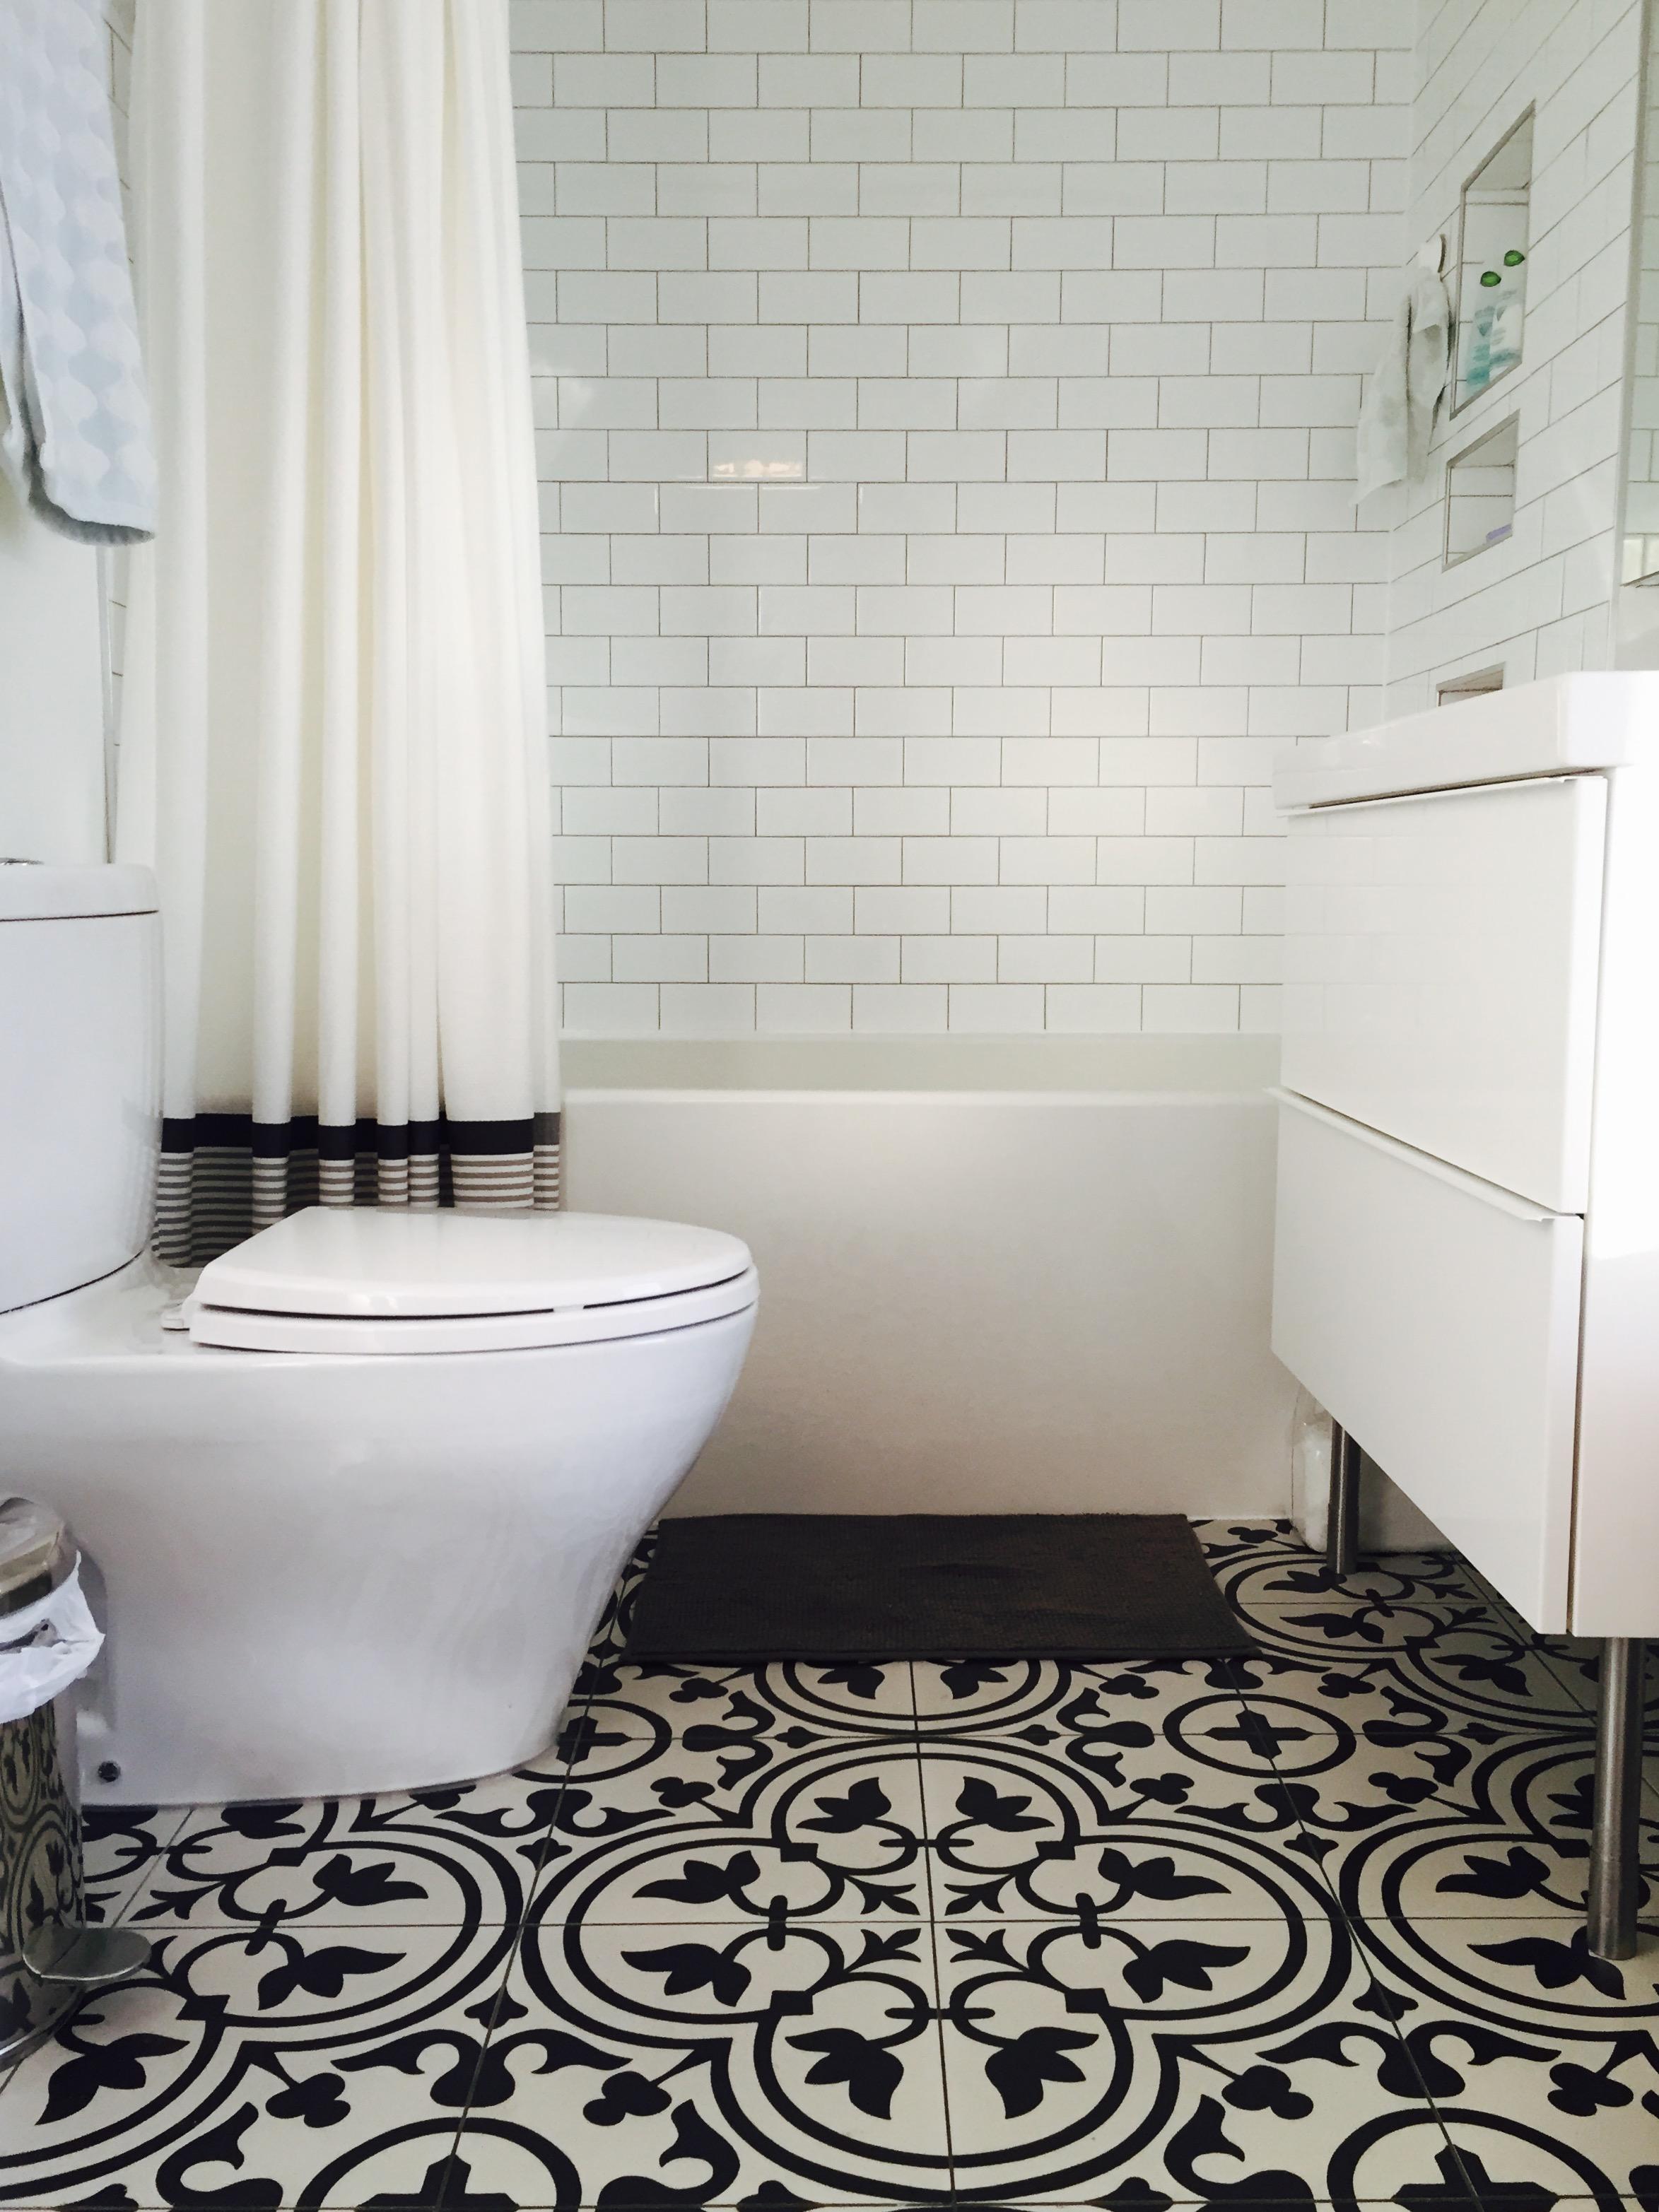 Millcreek Ravine Bathroom Renovation, Artistic Tile, Edmonton, Alberta